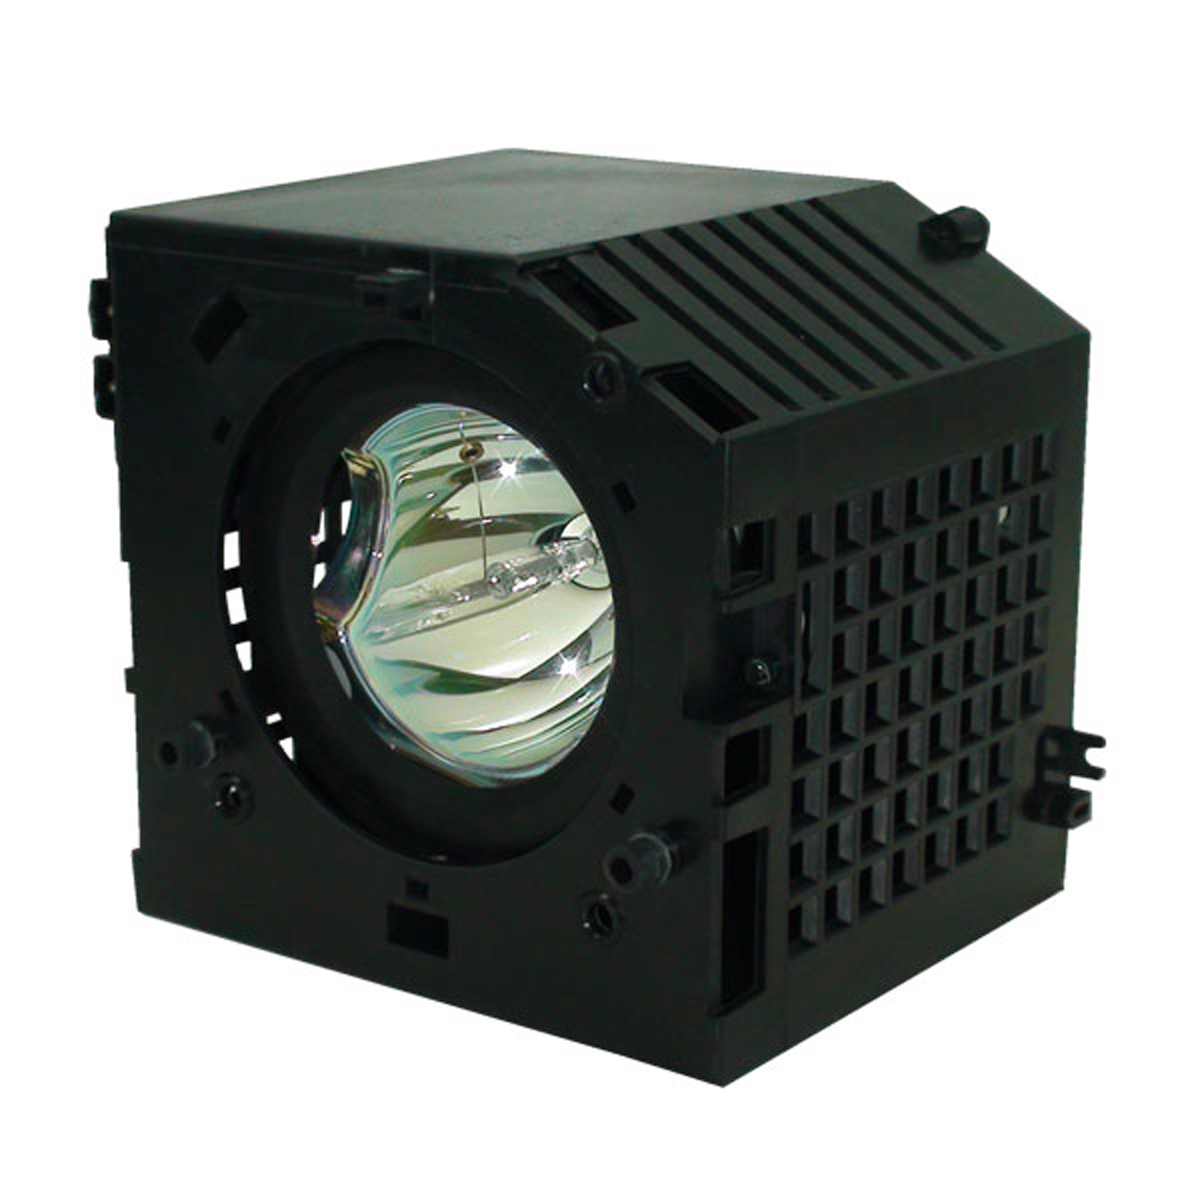 Zenith 6912B22007B TV Lamp